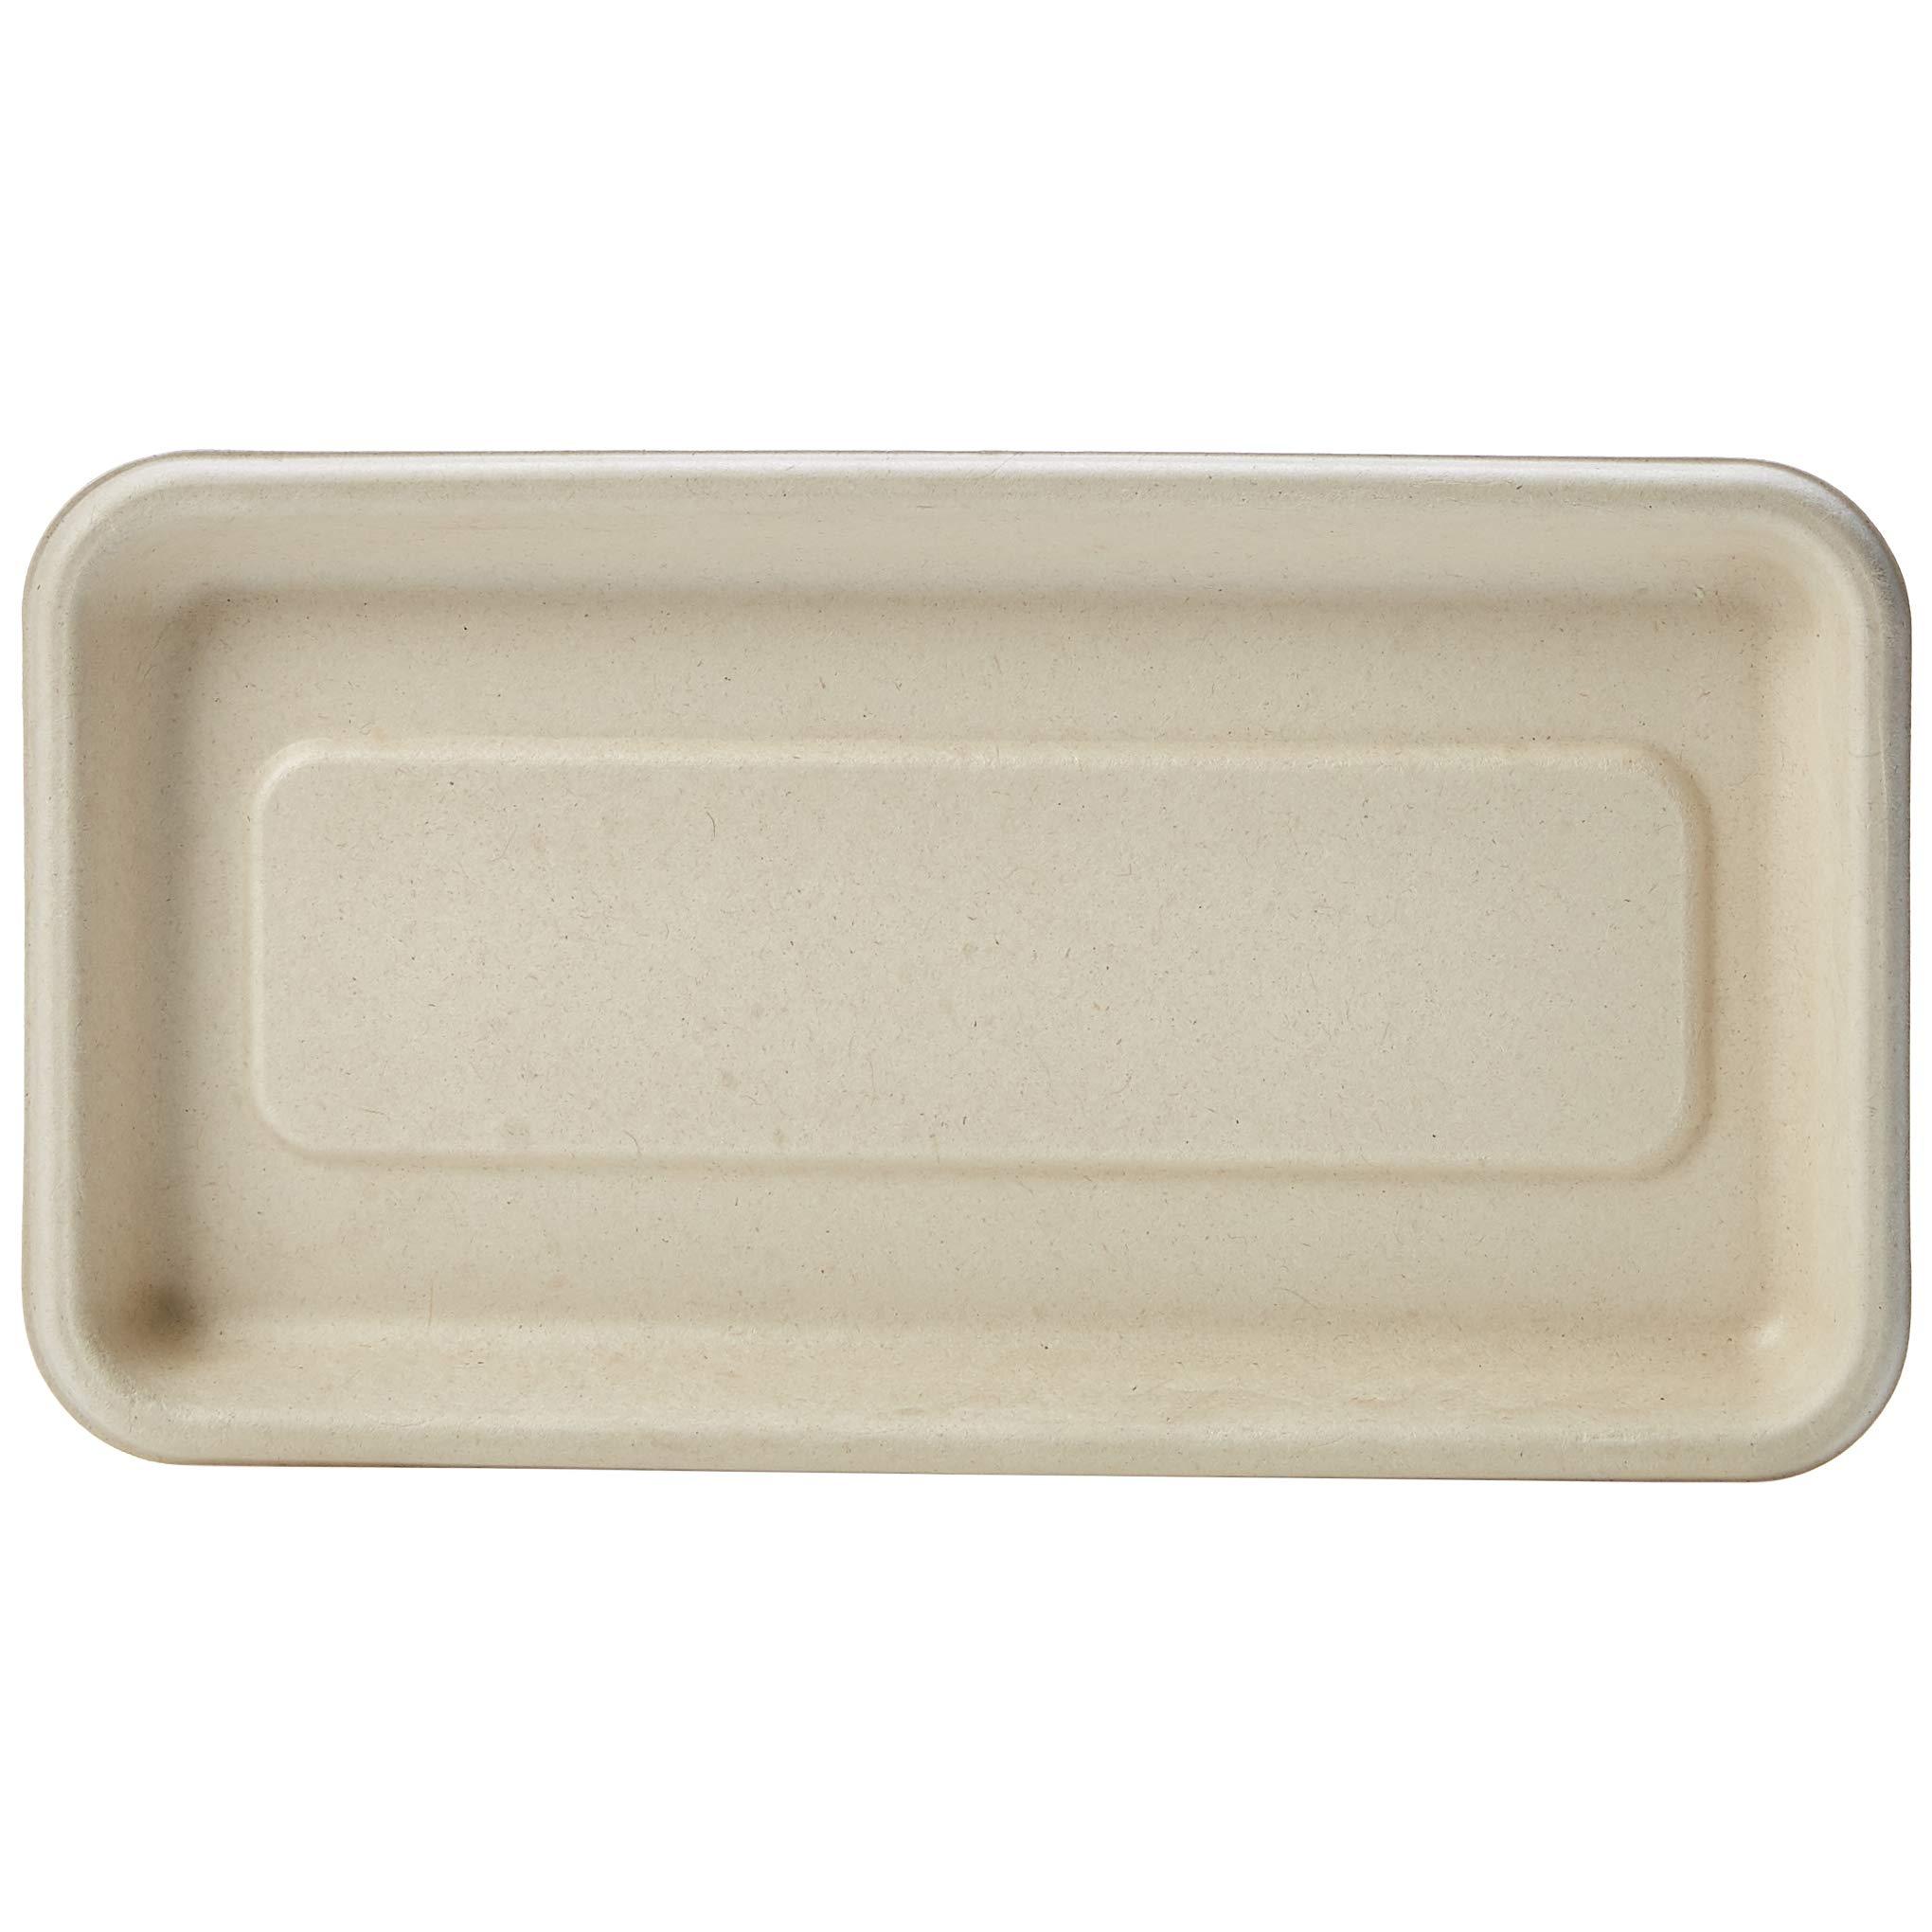 AmazonBasics Compostable Mini Tray, 8.3 x 4.5 x 0.6 Inches, Kraft, 500 Trays